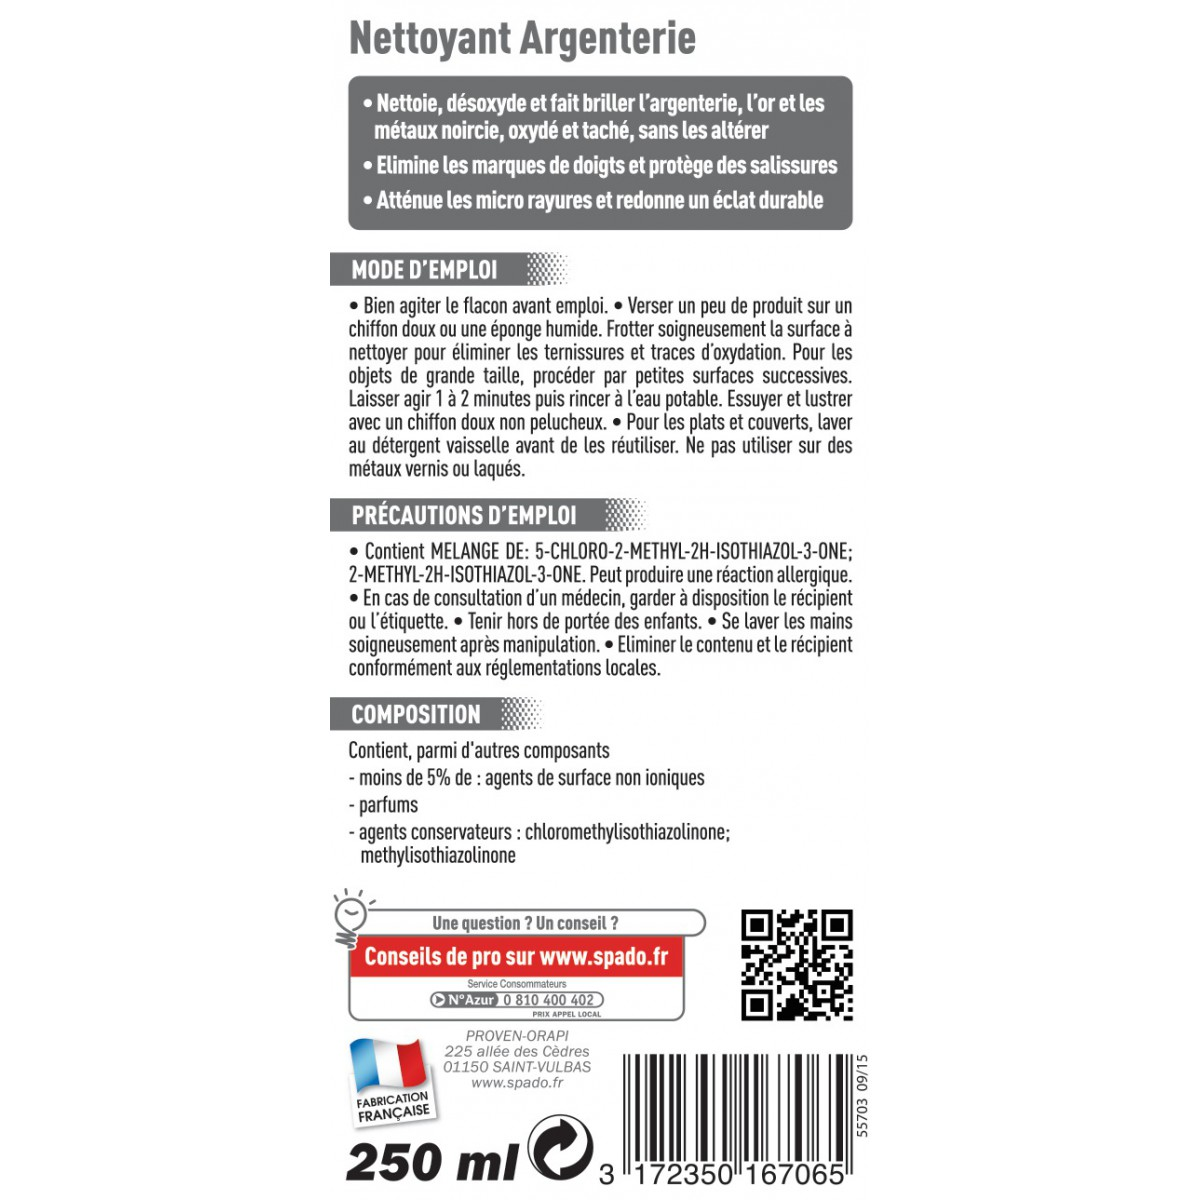 Nettoyant argenterie Spado - Flacon 250 ml